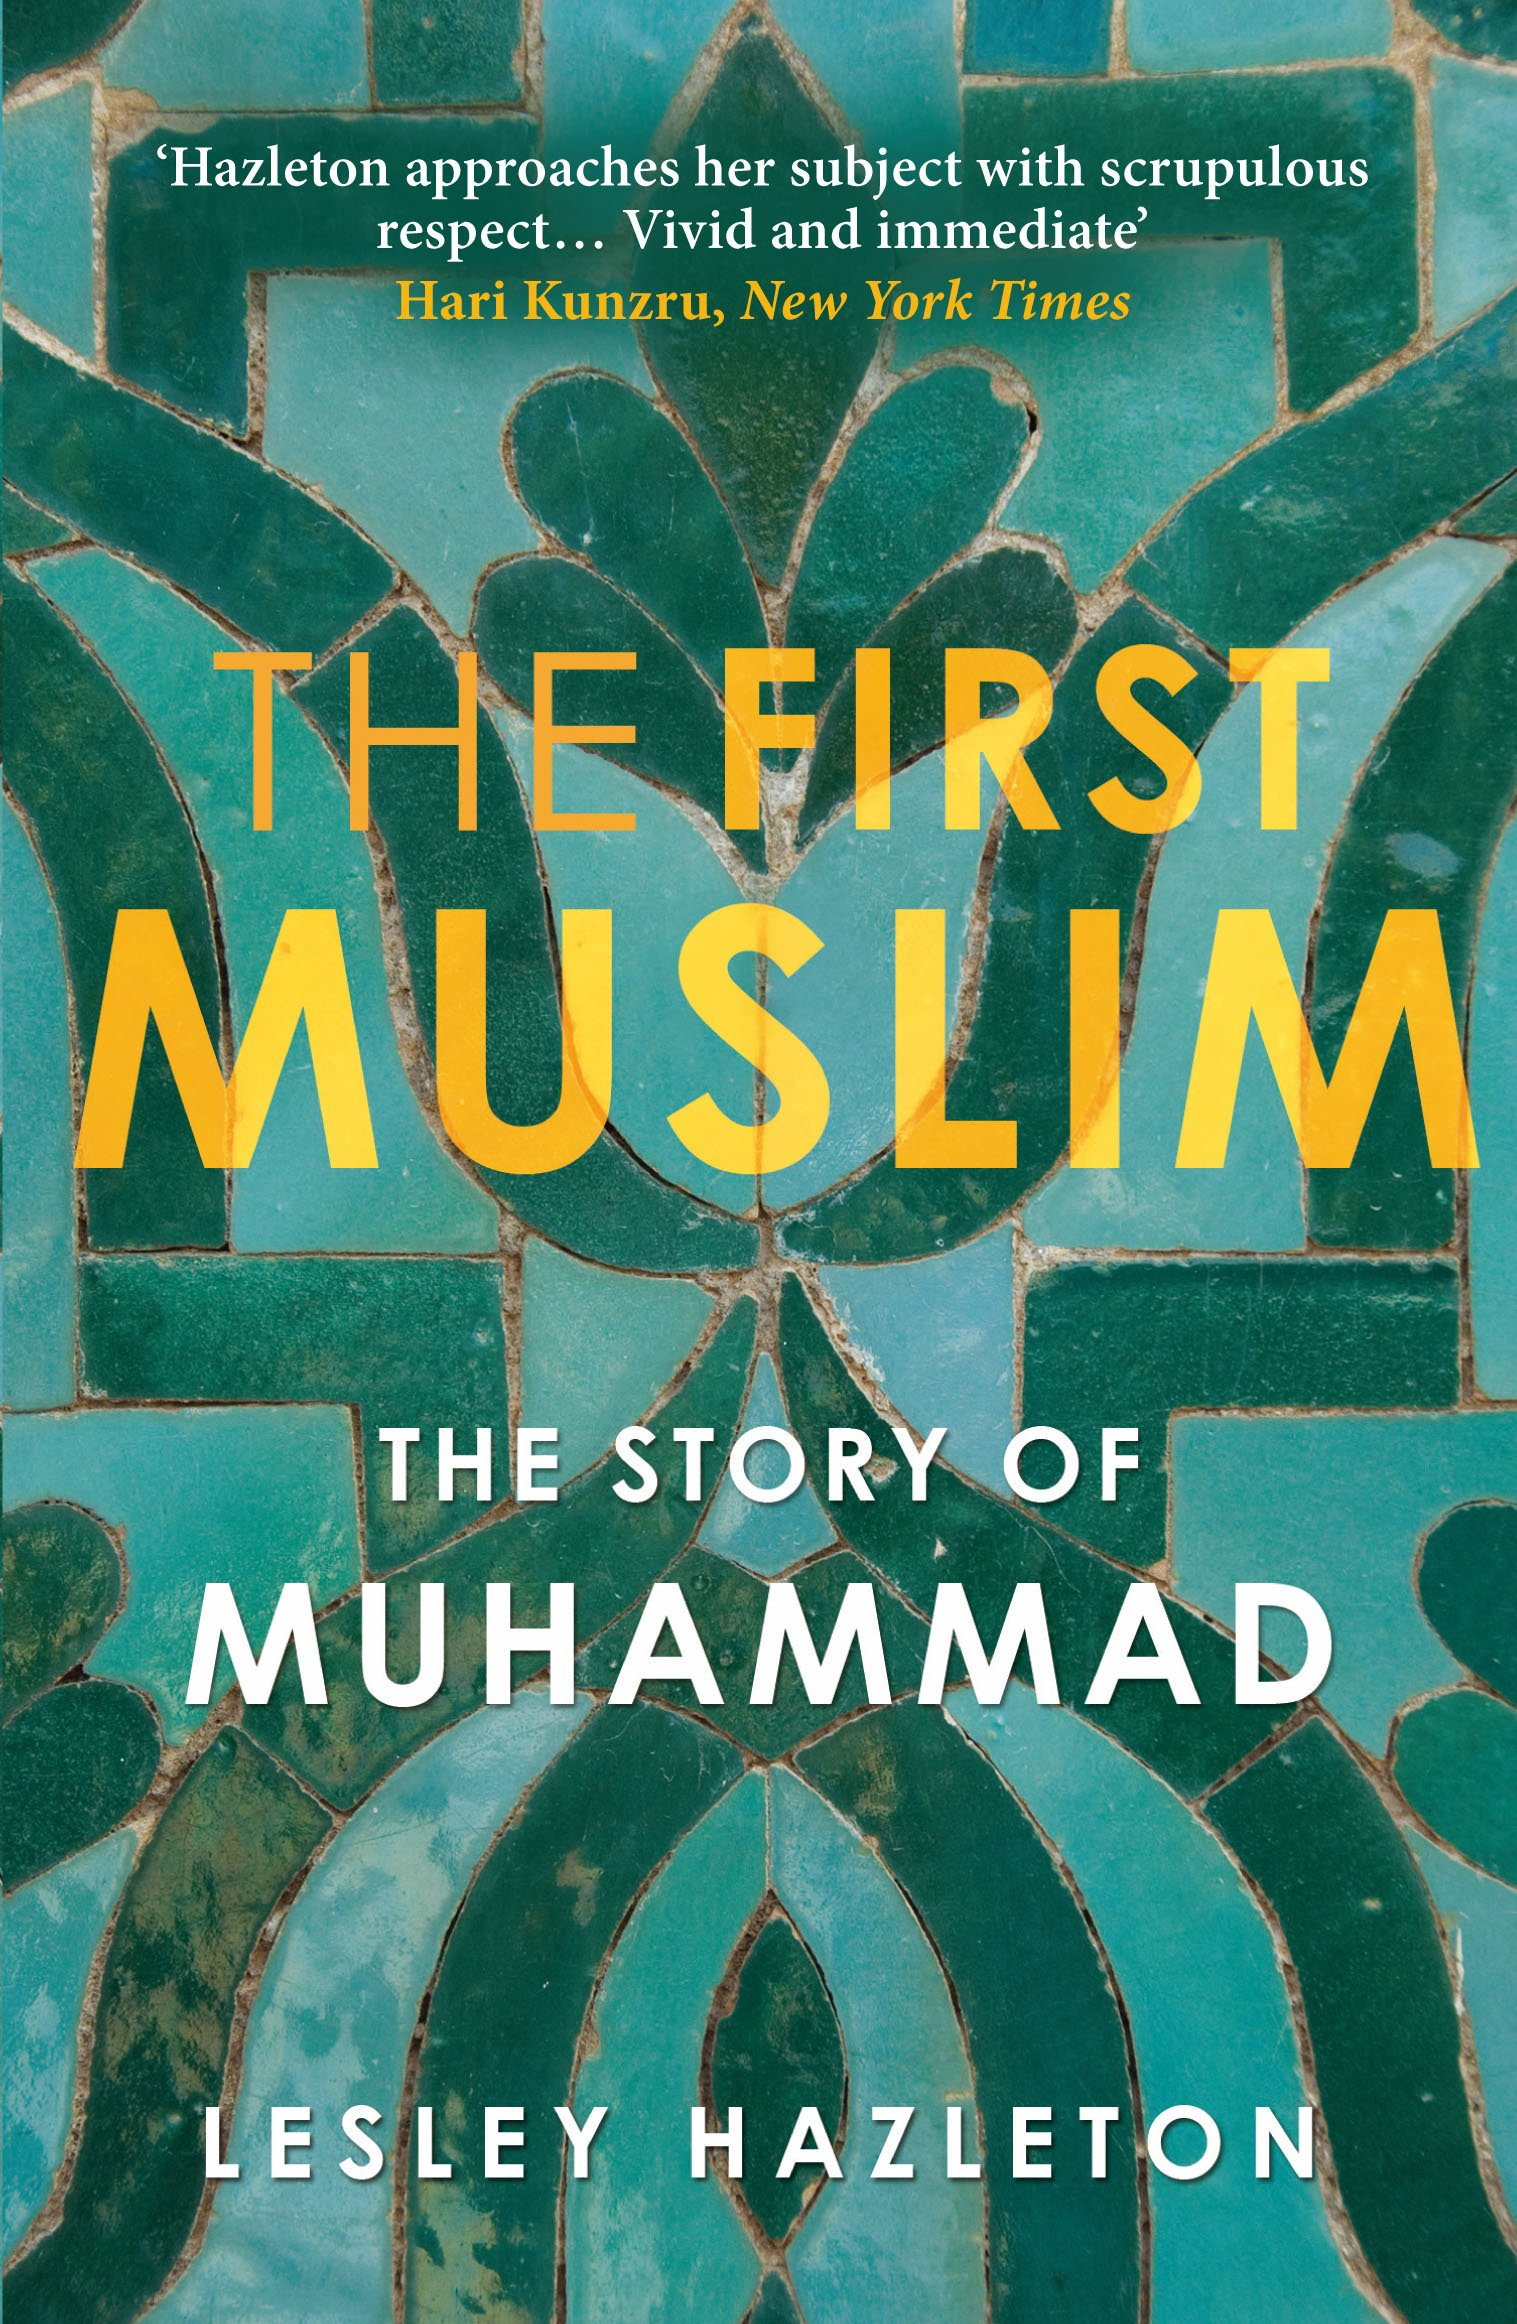 The First Muslim The Story of Muhammad Amazon.de Hazleton ...